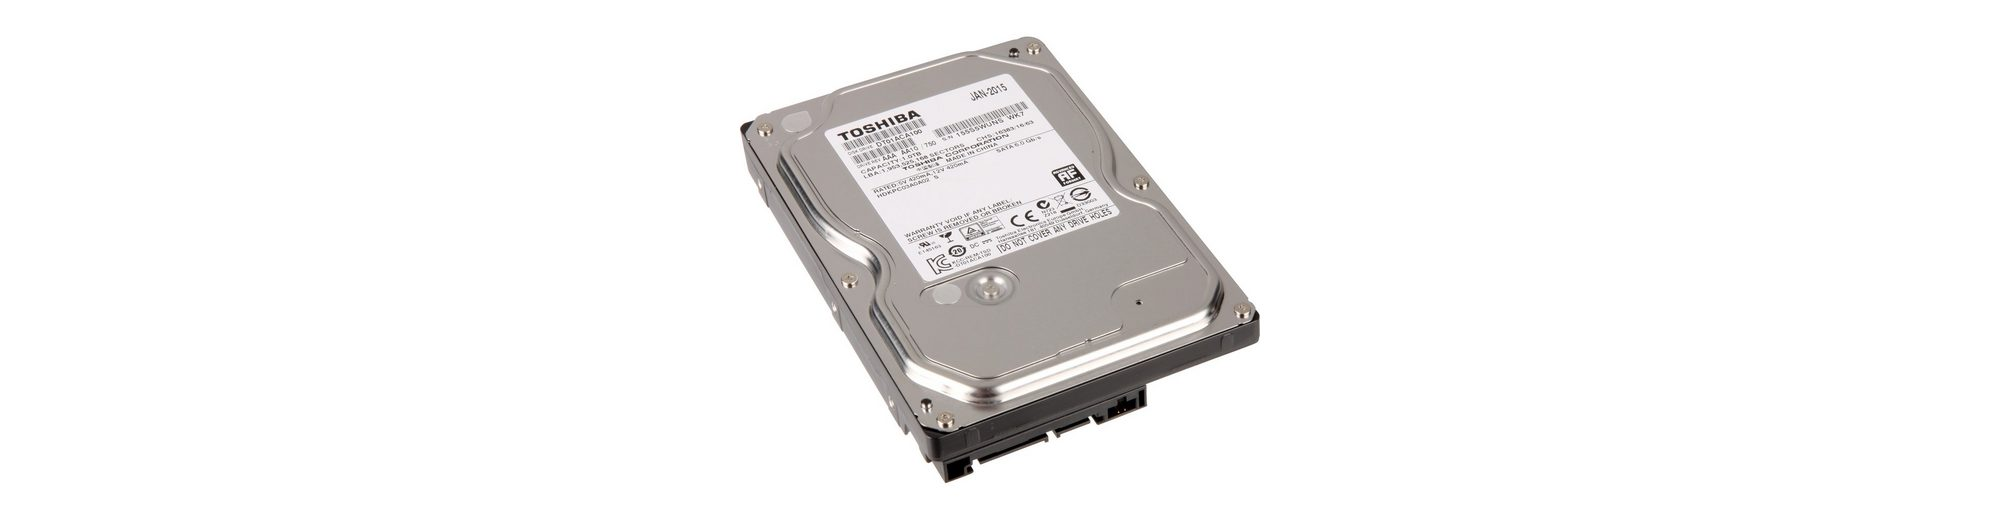 Toshiba Festplatte »DT01ACA100 1 TB«